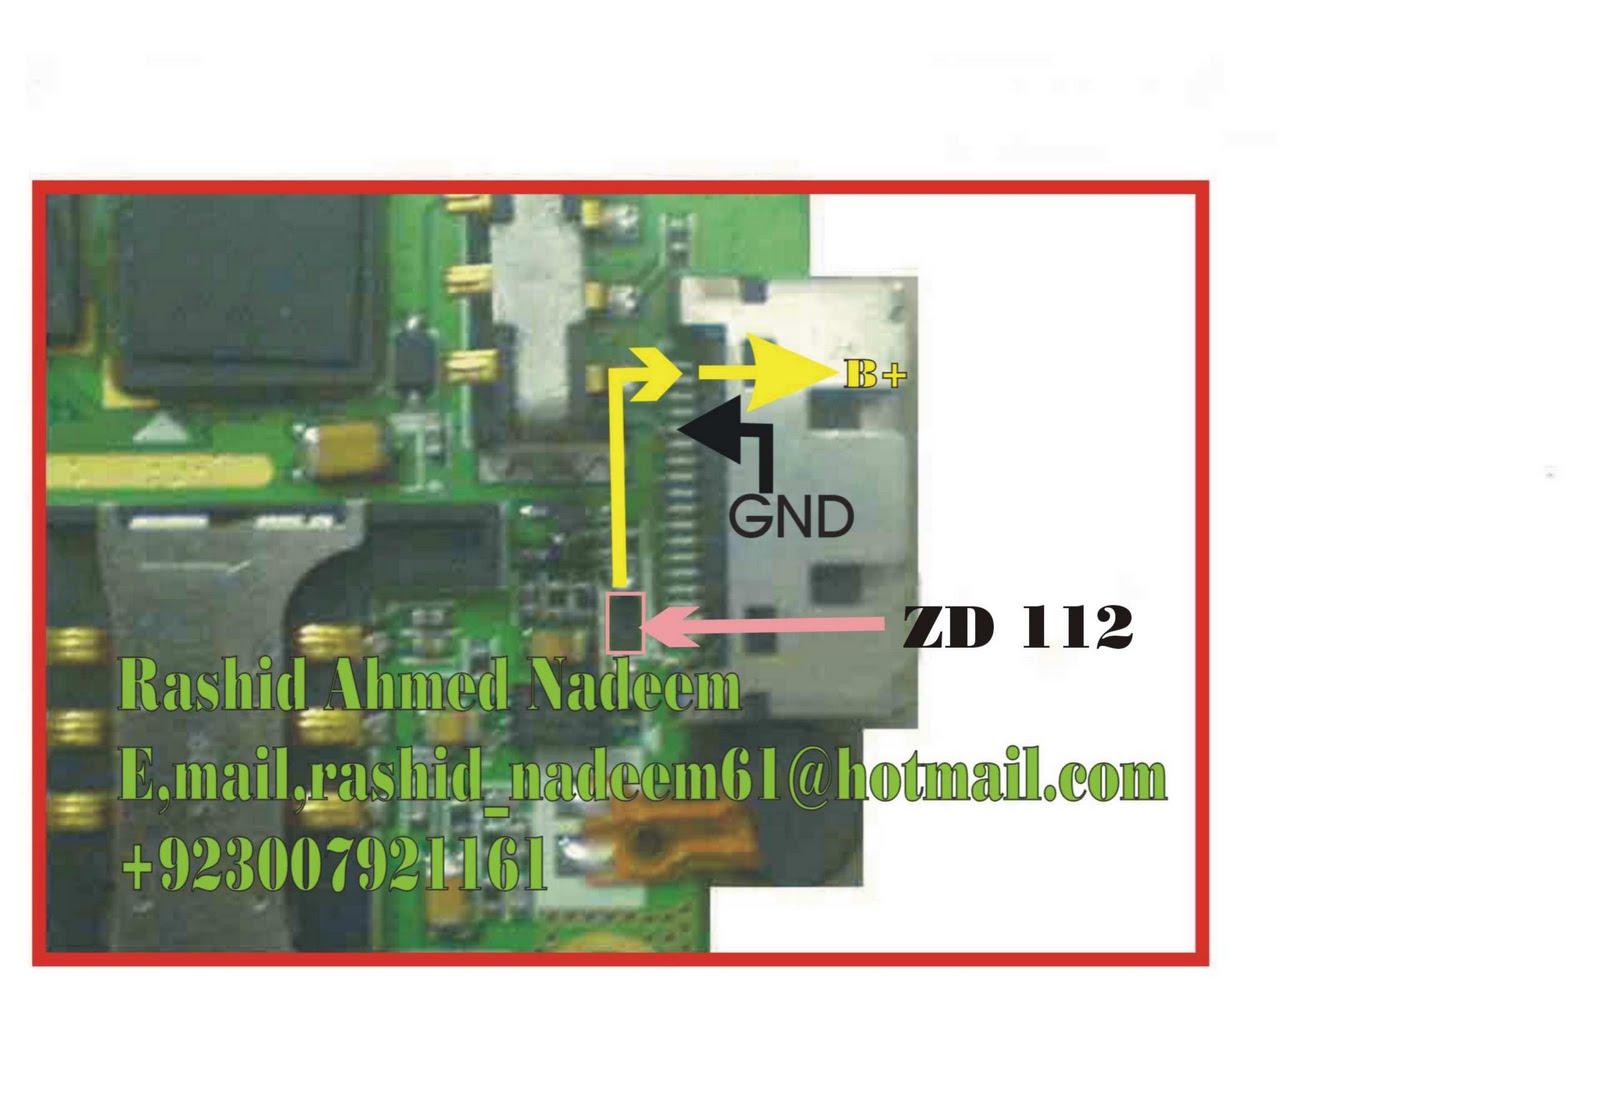 Samsung Sgh E715 Schematic Diagram Phone Diagram